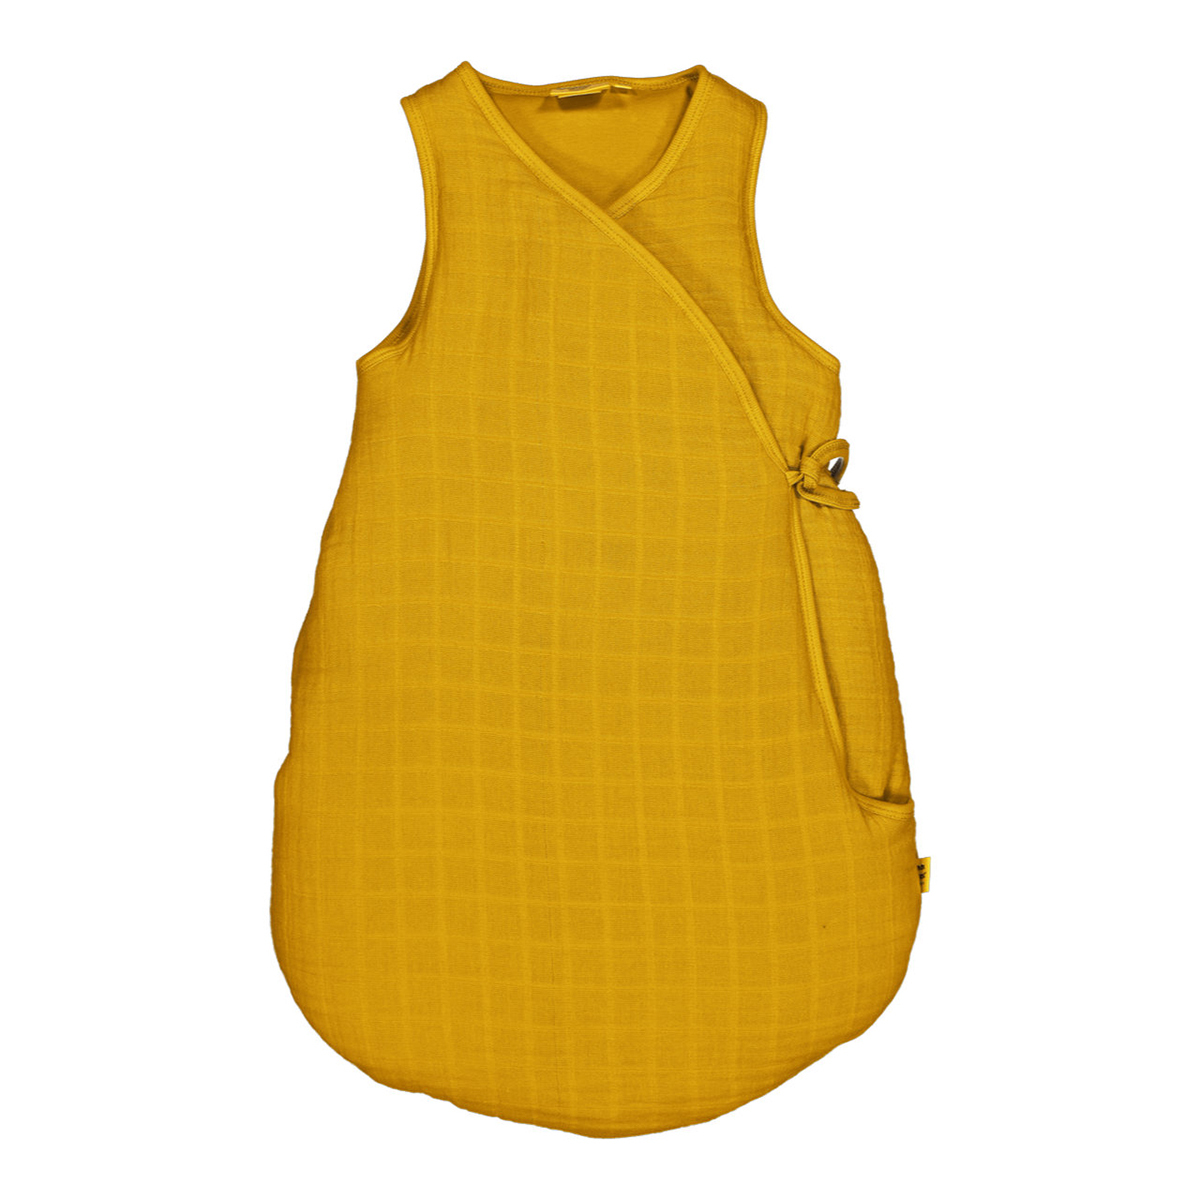 Gigoteuse Gigoteuse Sleepy Mustard - 12/24 Mois Gigoteuse Sleepy Mustard - 12/24 Mois